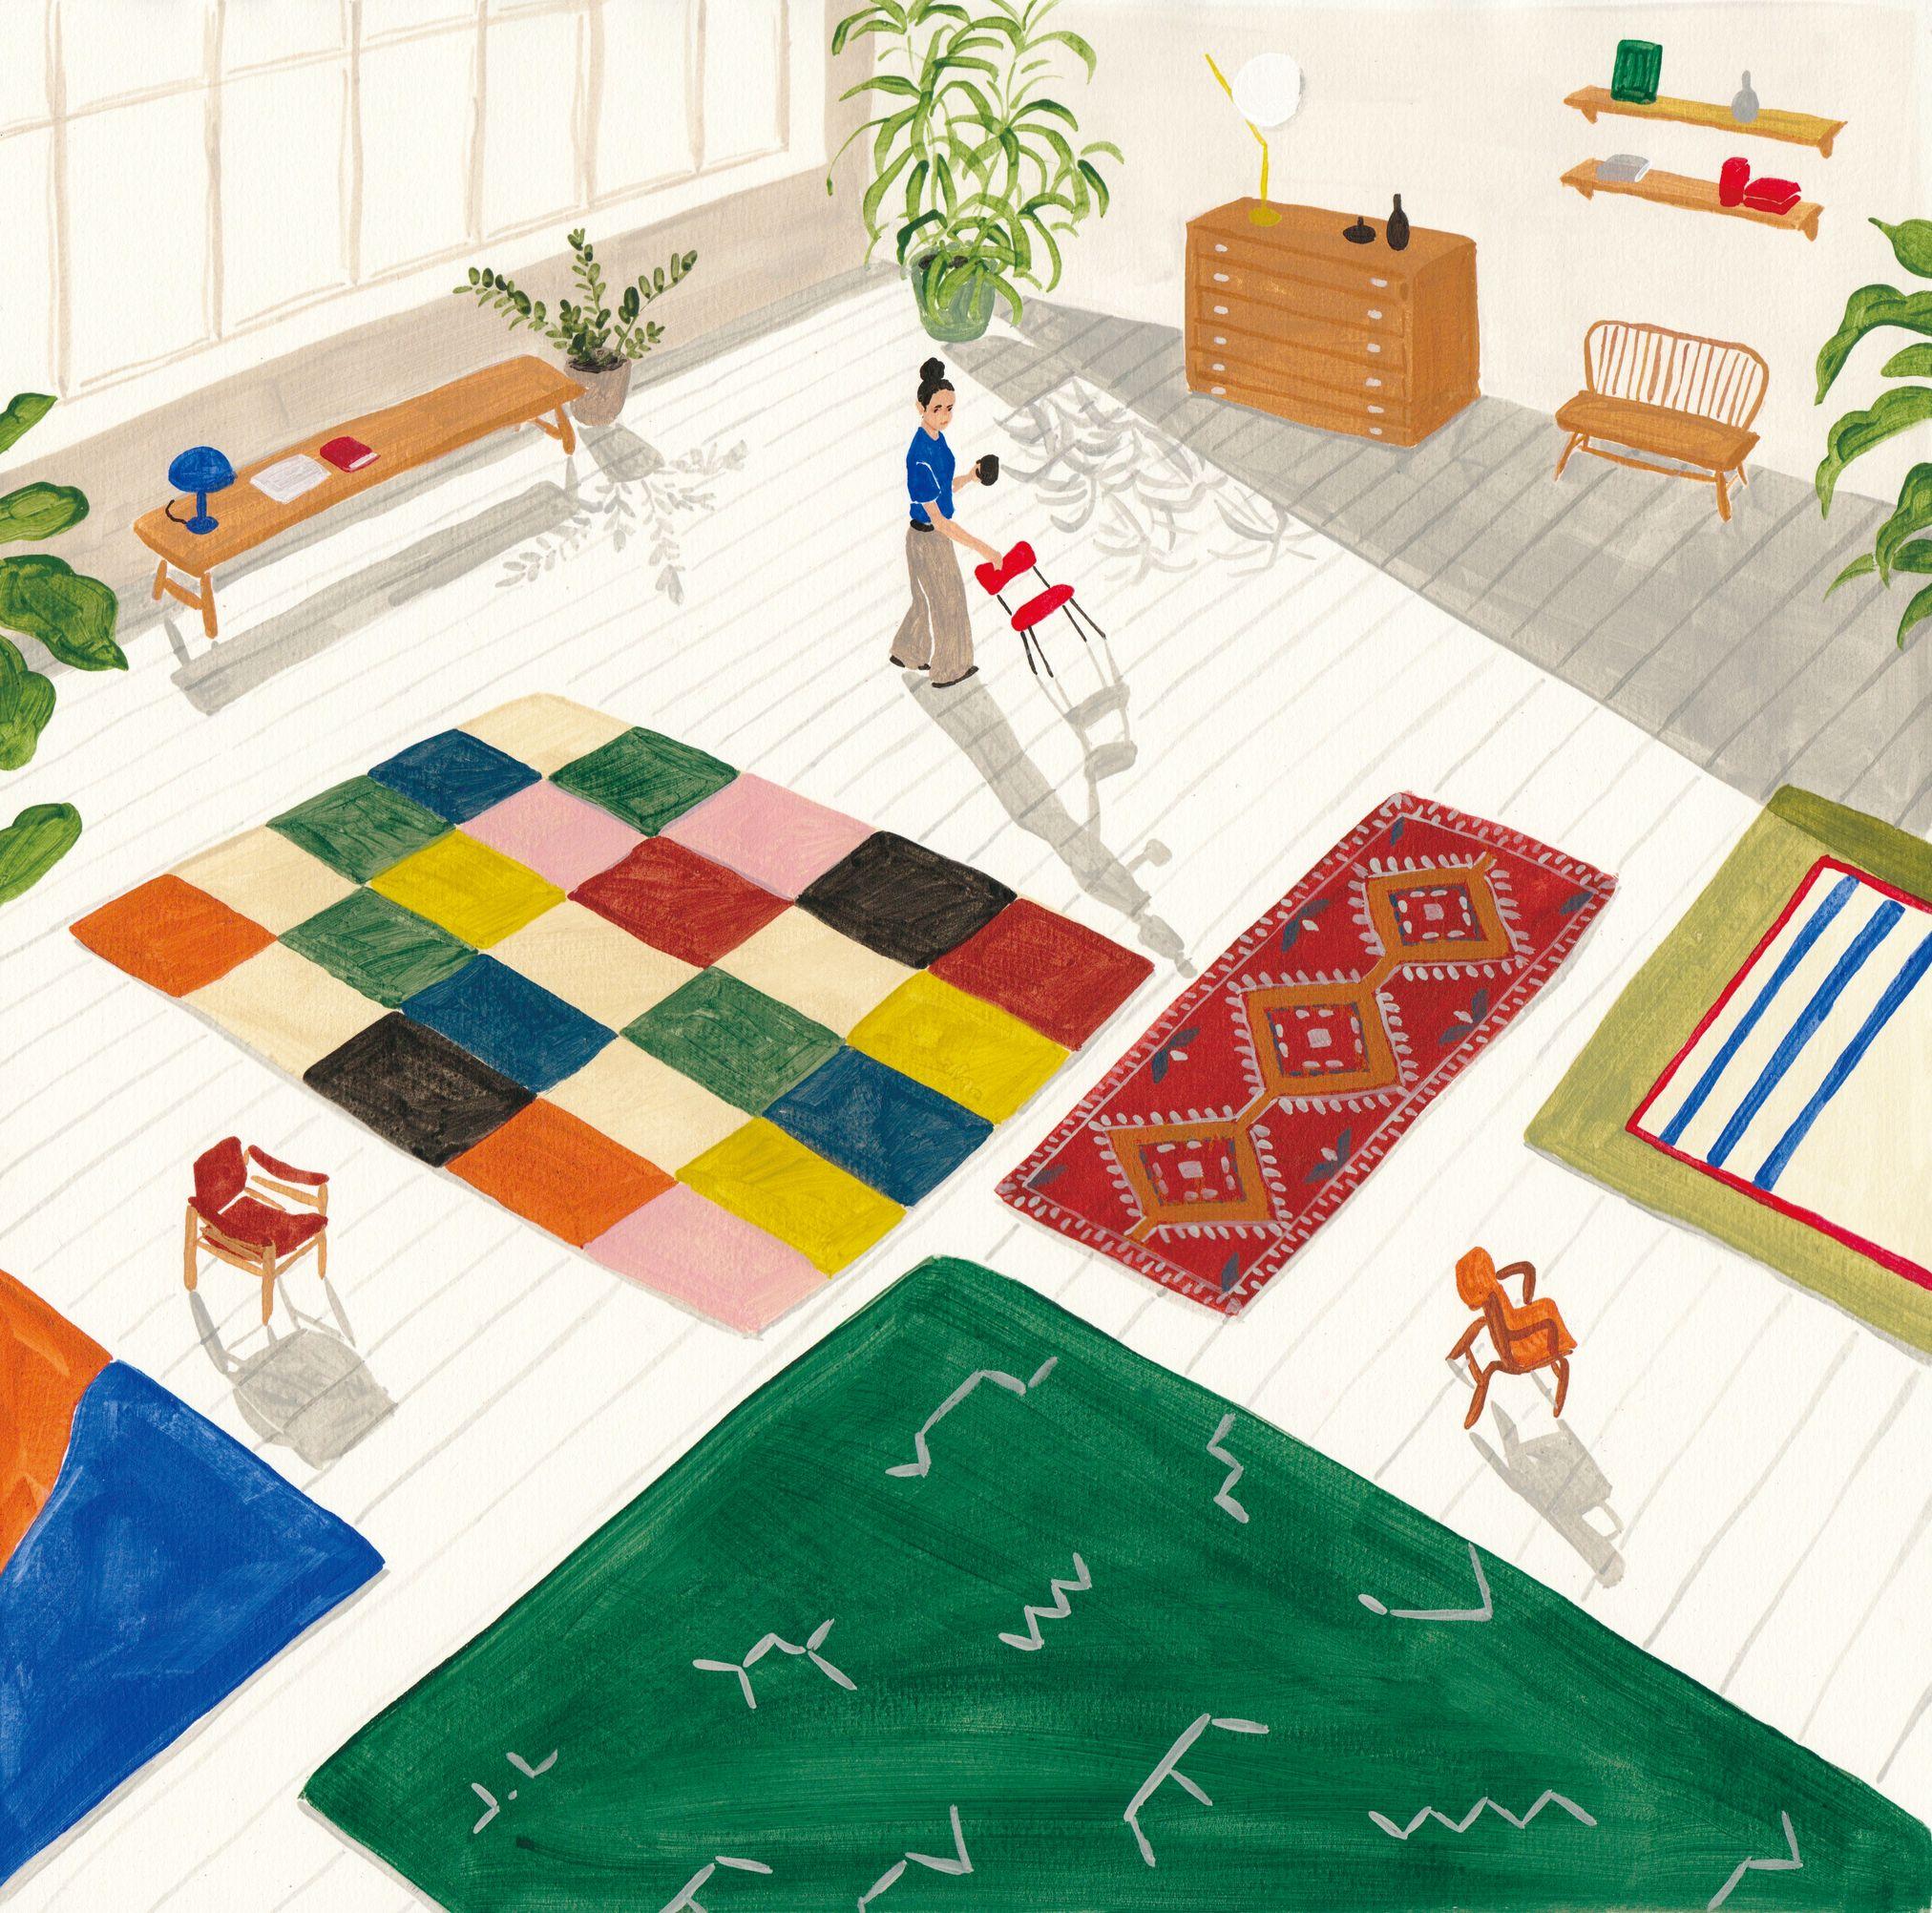 garance-illustration-Yukiko-Noritake-Projet-perso_42_Interieur_web